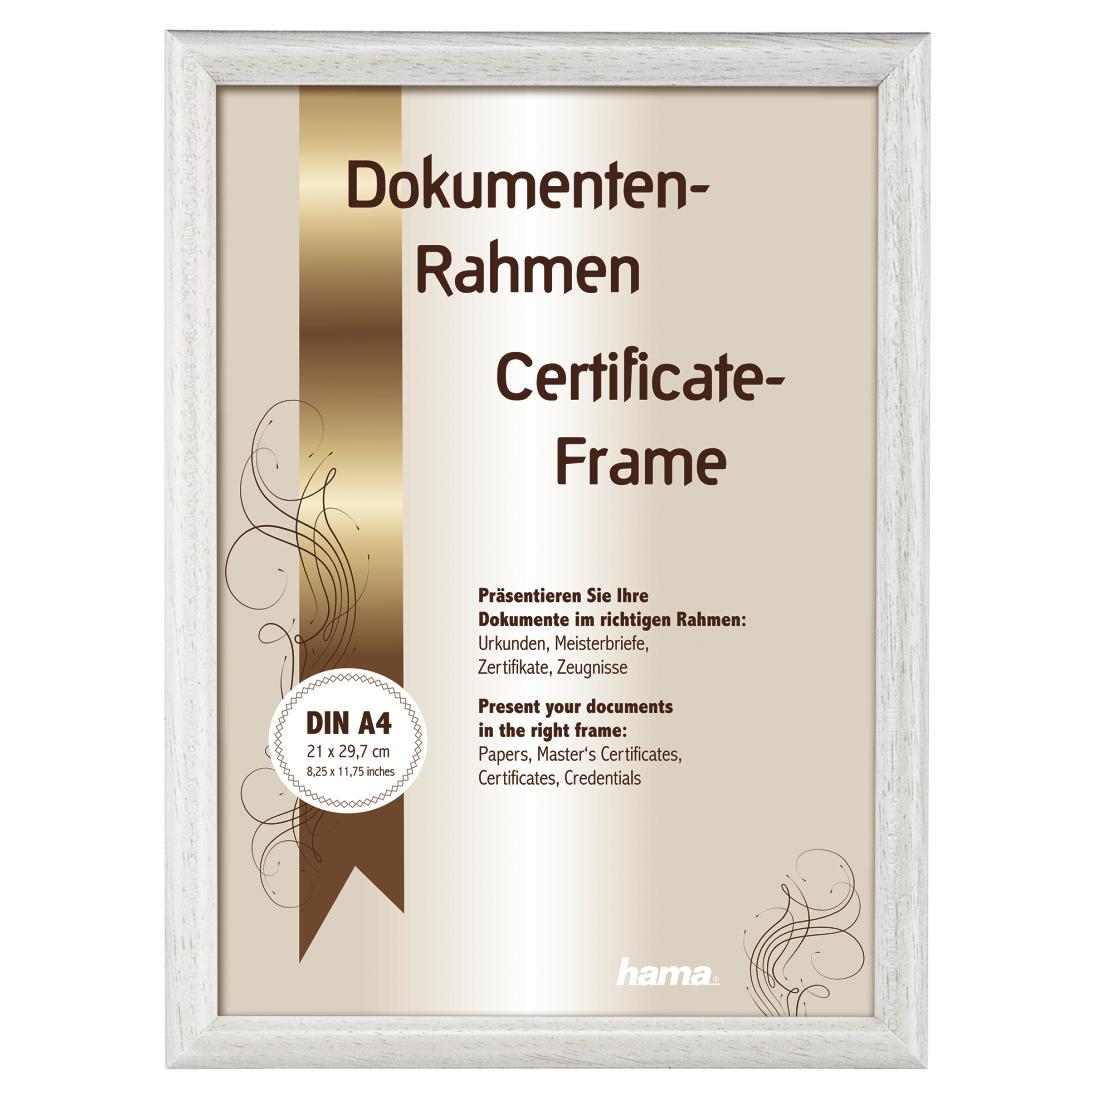 00064682 Hama Oregon Wooden Frame White 21 X 297 Cm Din A4